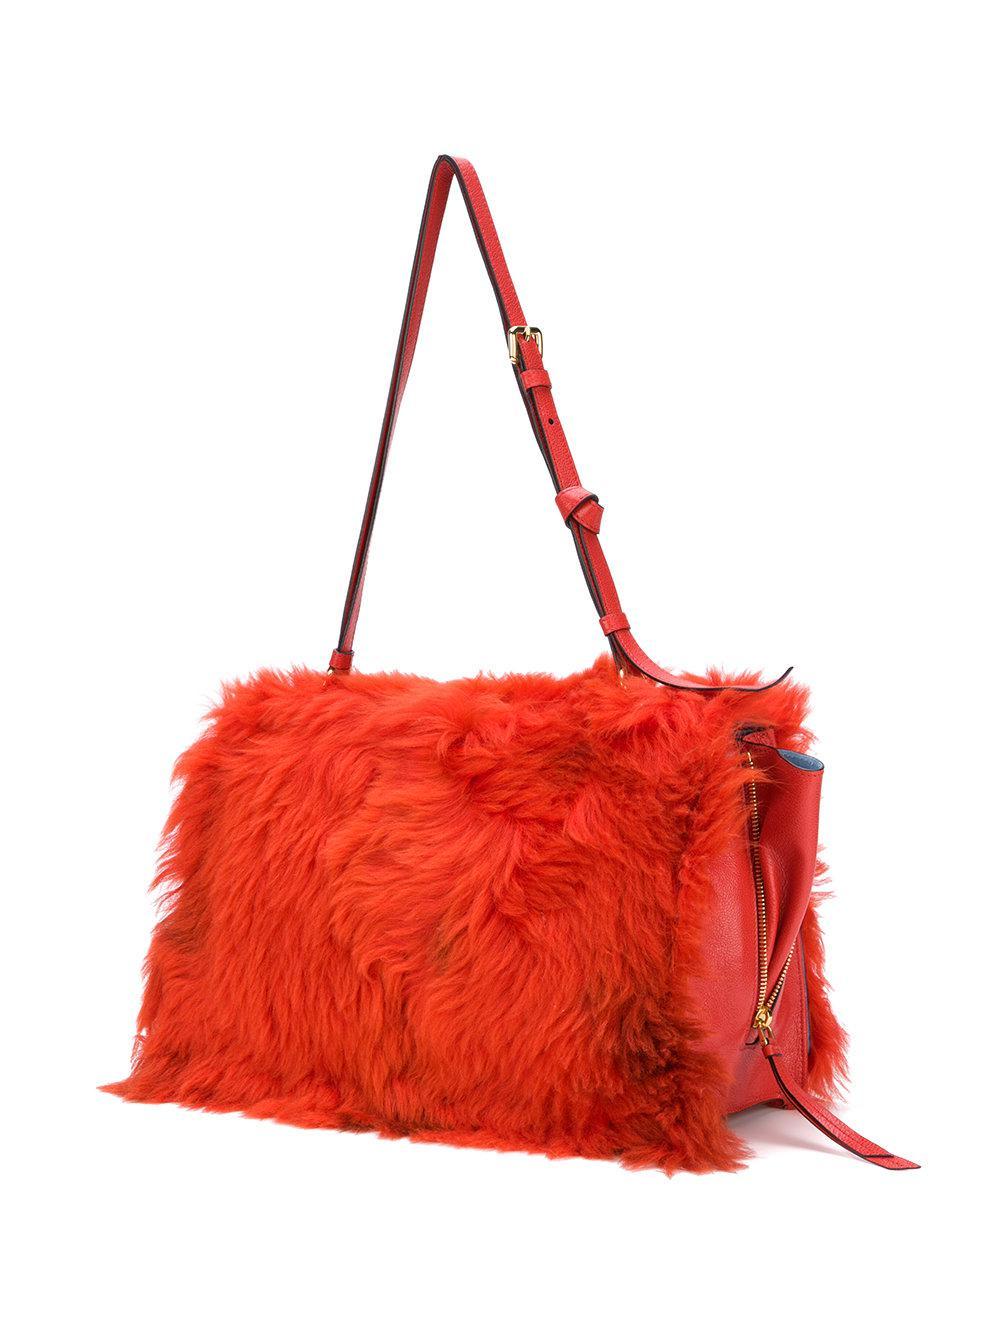 Shearling flap bag - Red Prada 8t1oyg8